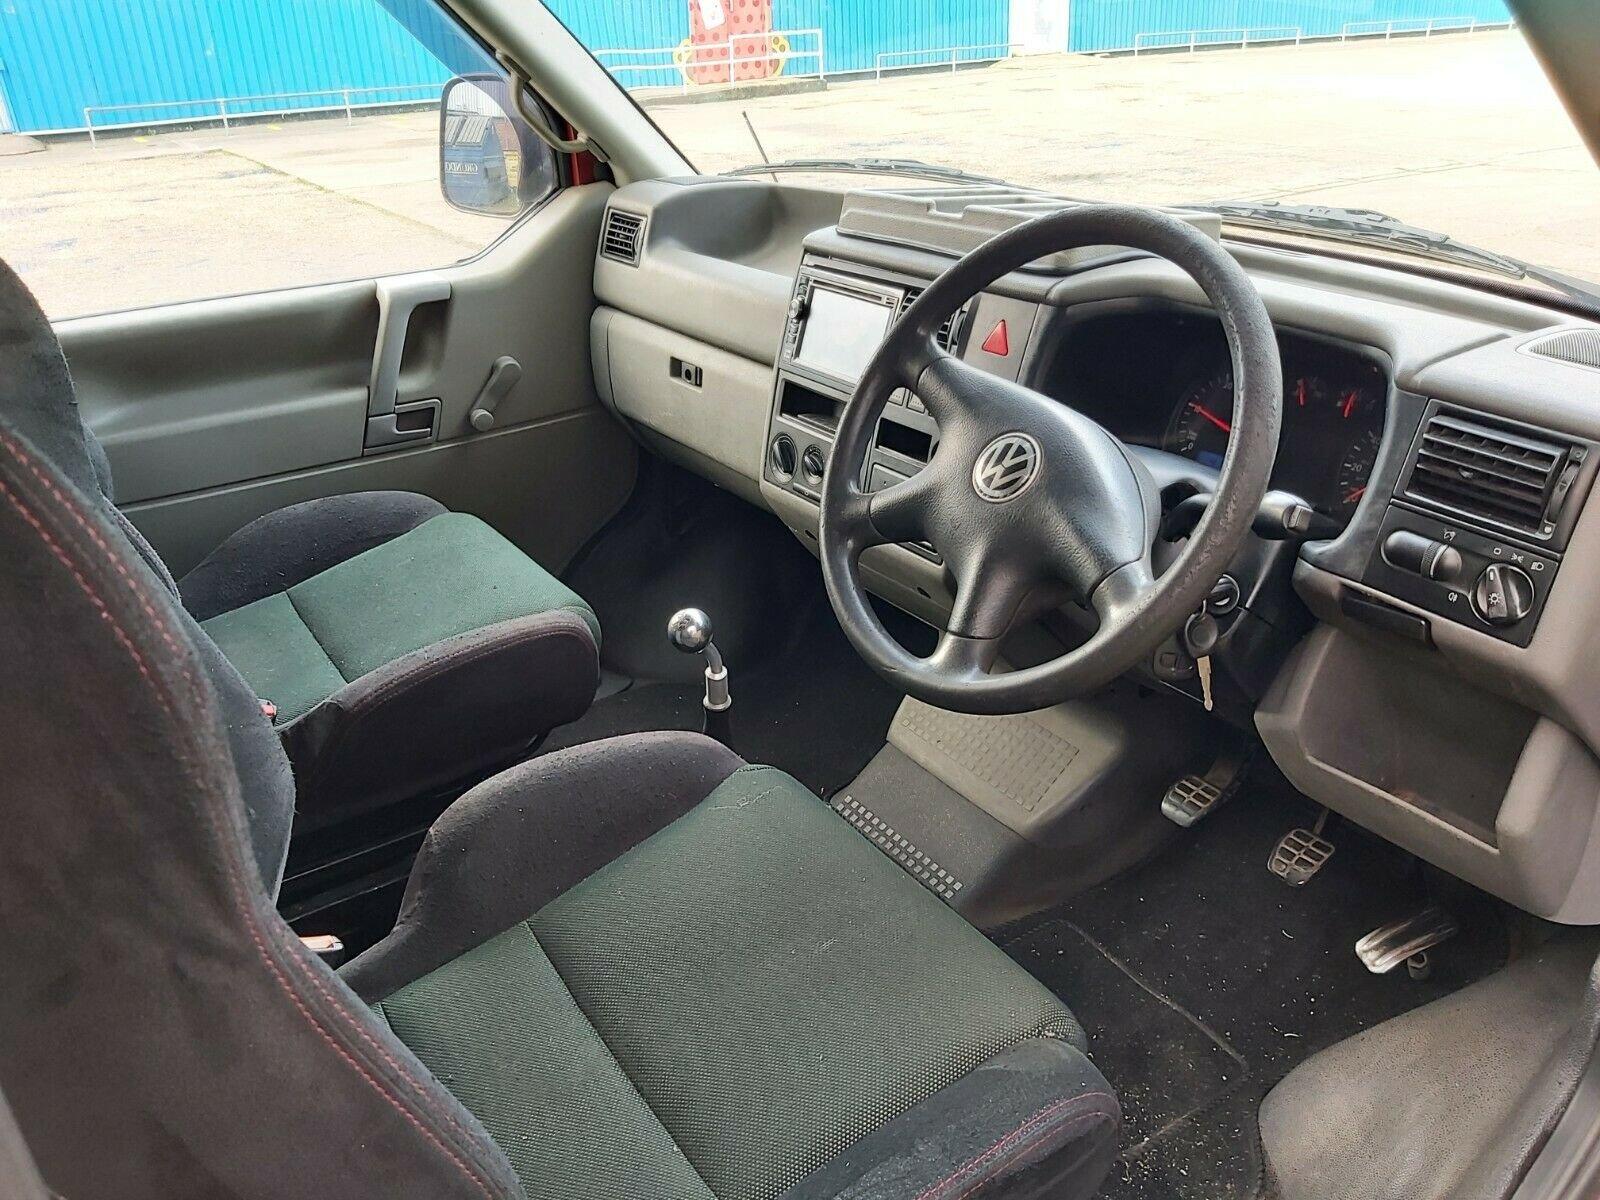 2002 Volkswagen T4 campervan 1.9TD For Sale (picture 5 of 10)